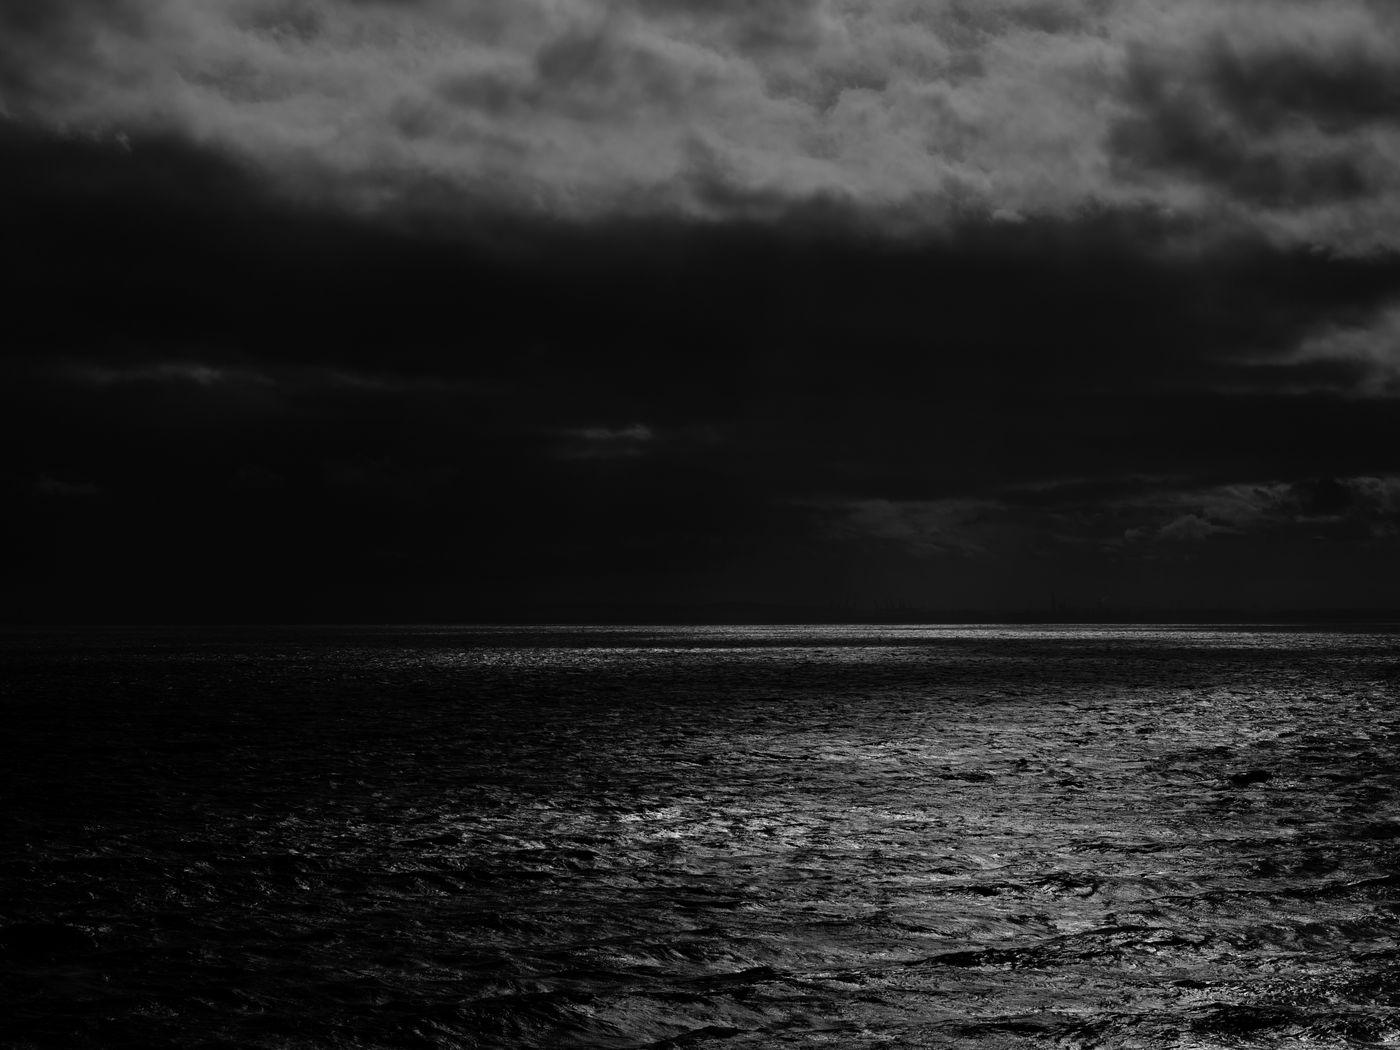 1400x1050 Wallpaper sea, horizon, bw, overcast, clouds, ripples